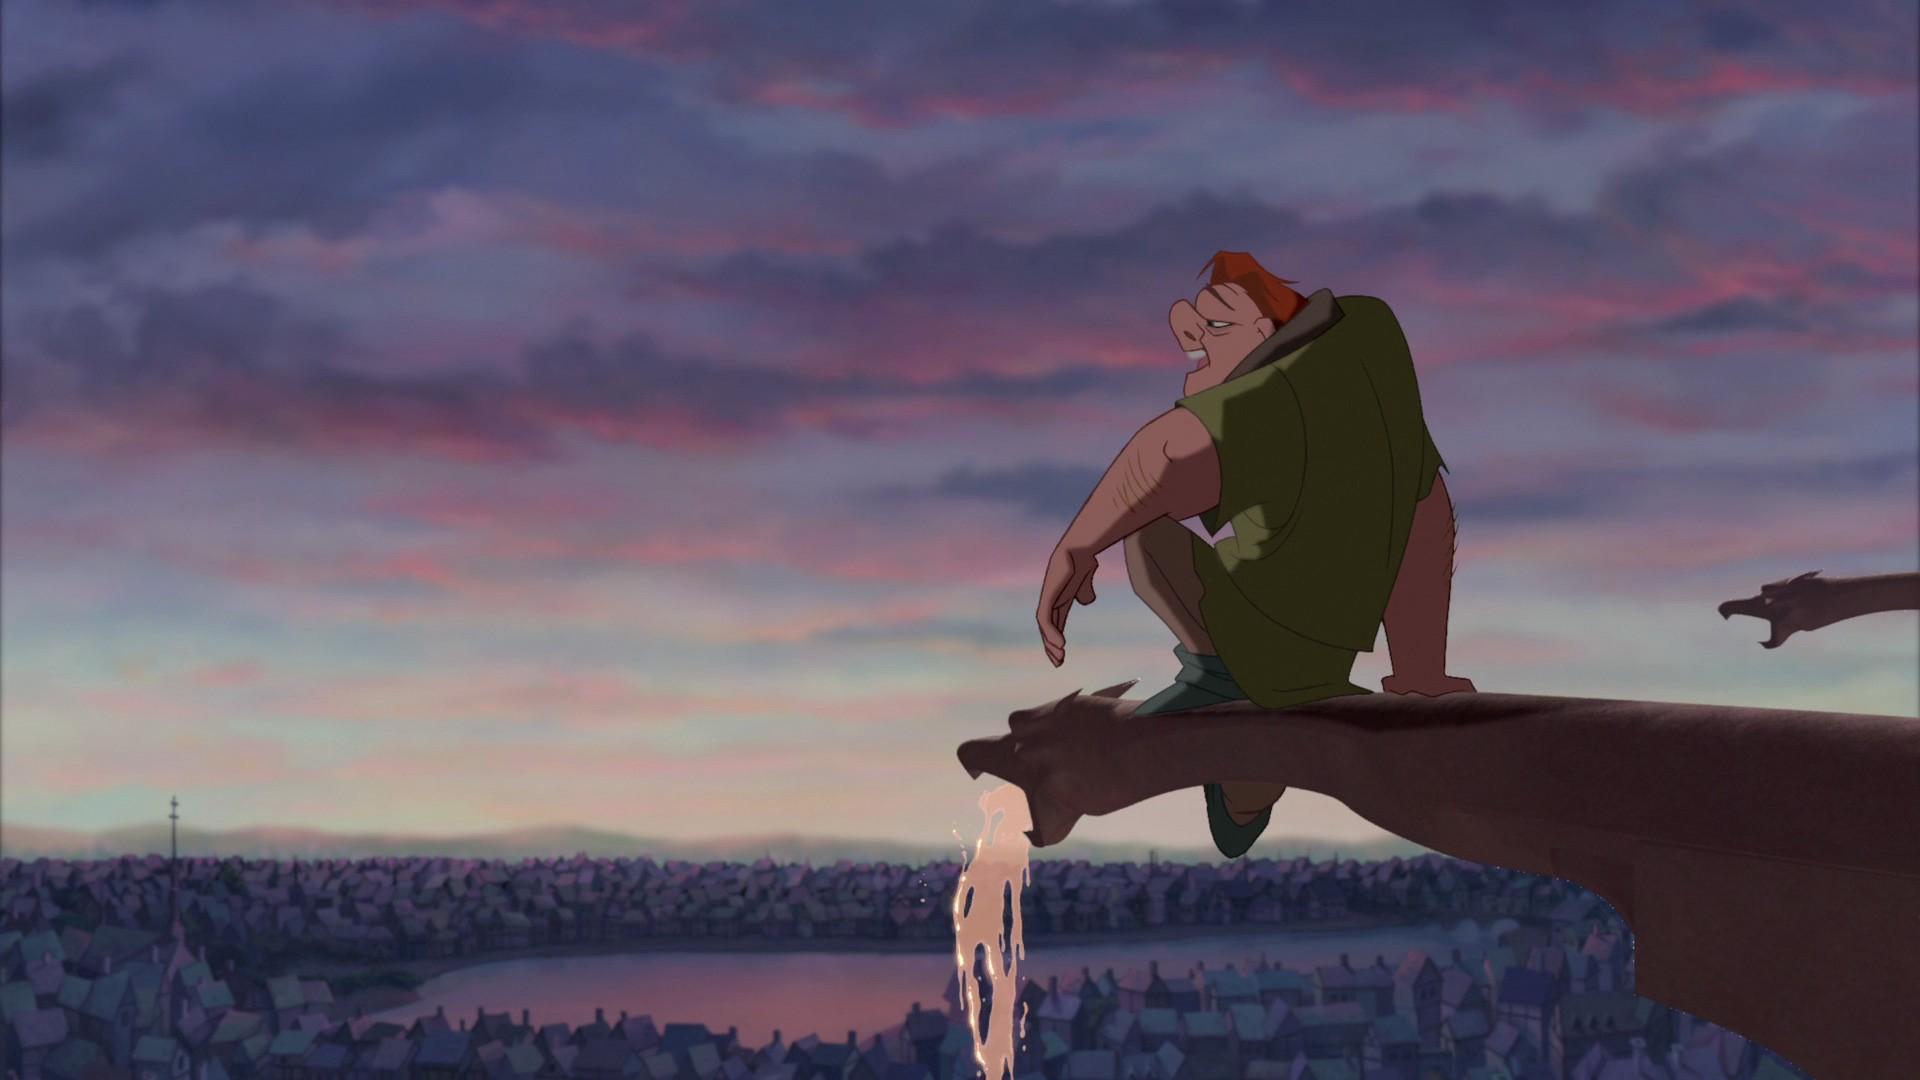 Quasimodo, perhaps the originator of social distancing, dreams of life outside the Bell Tower.